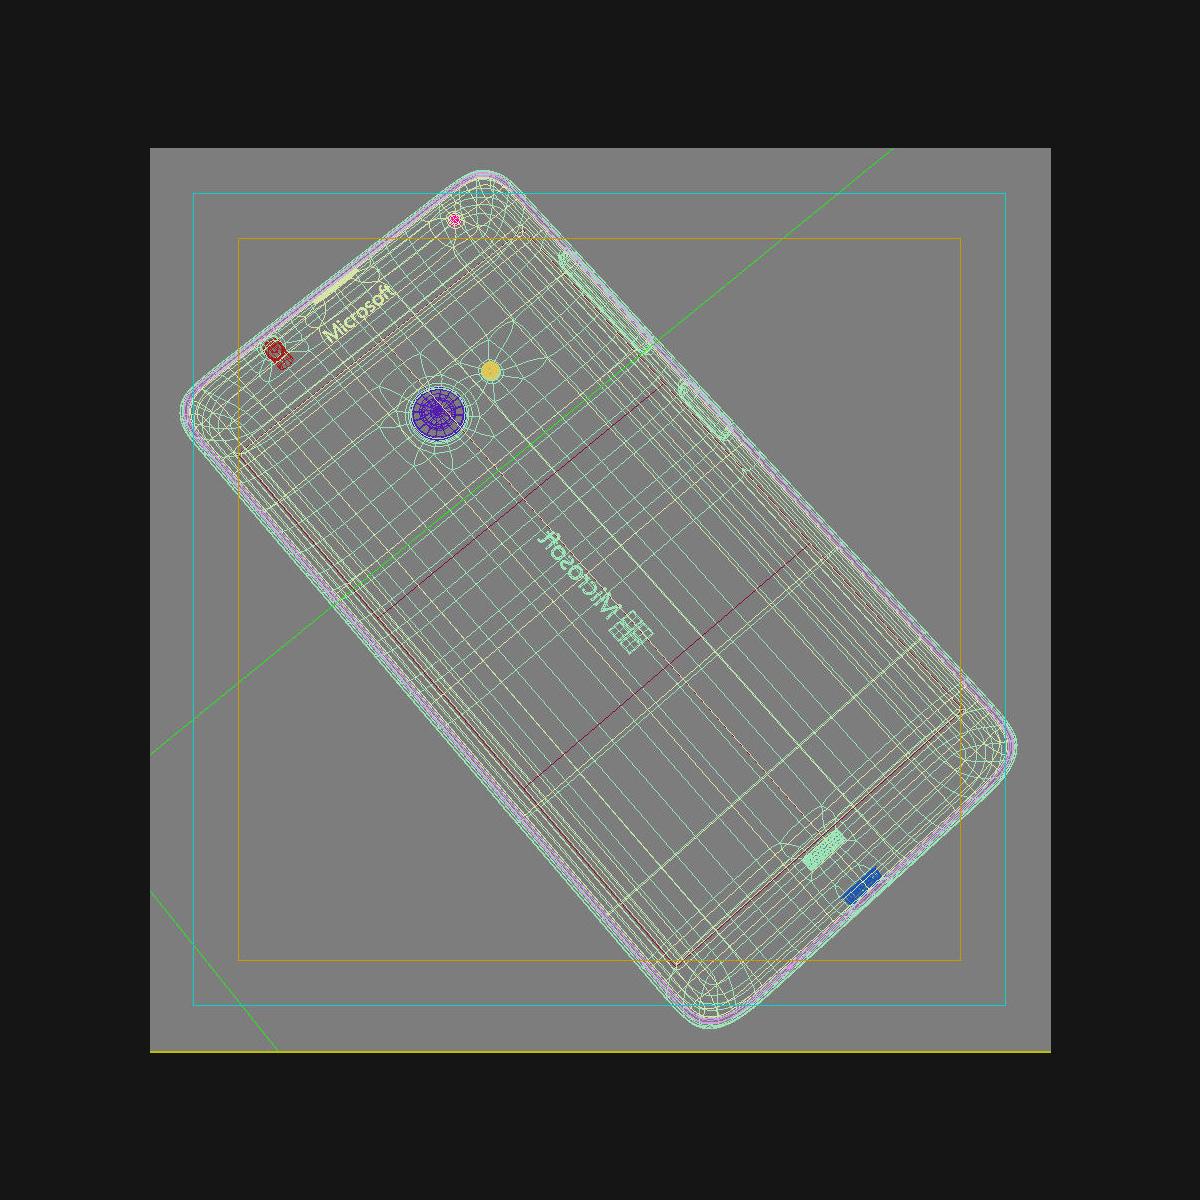 microsoft lumia 535 and dual sim orange 3d model 3ds max fbx c4d obj 204141